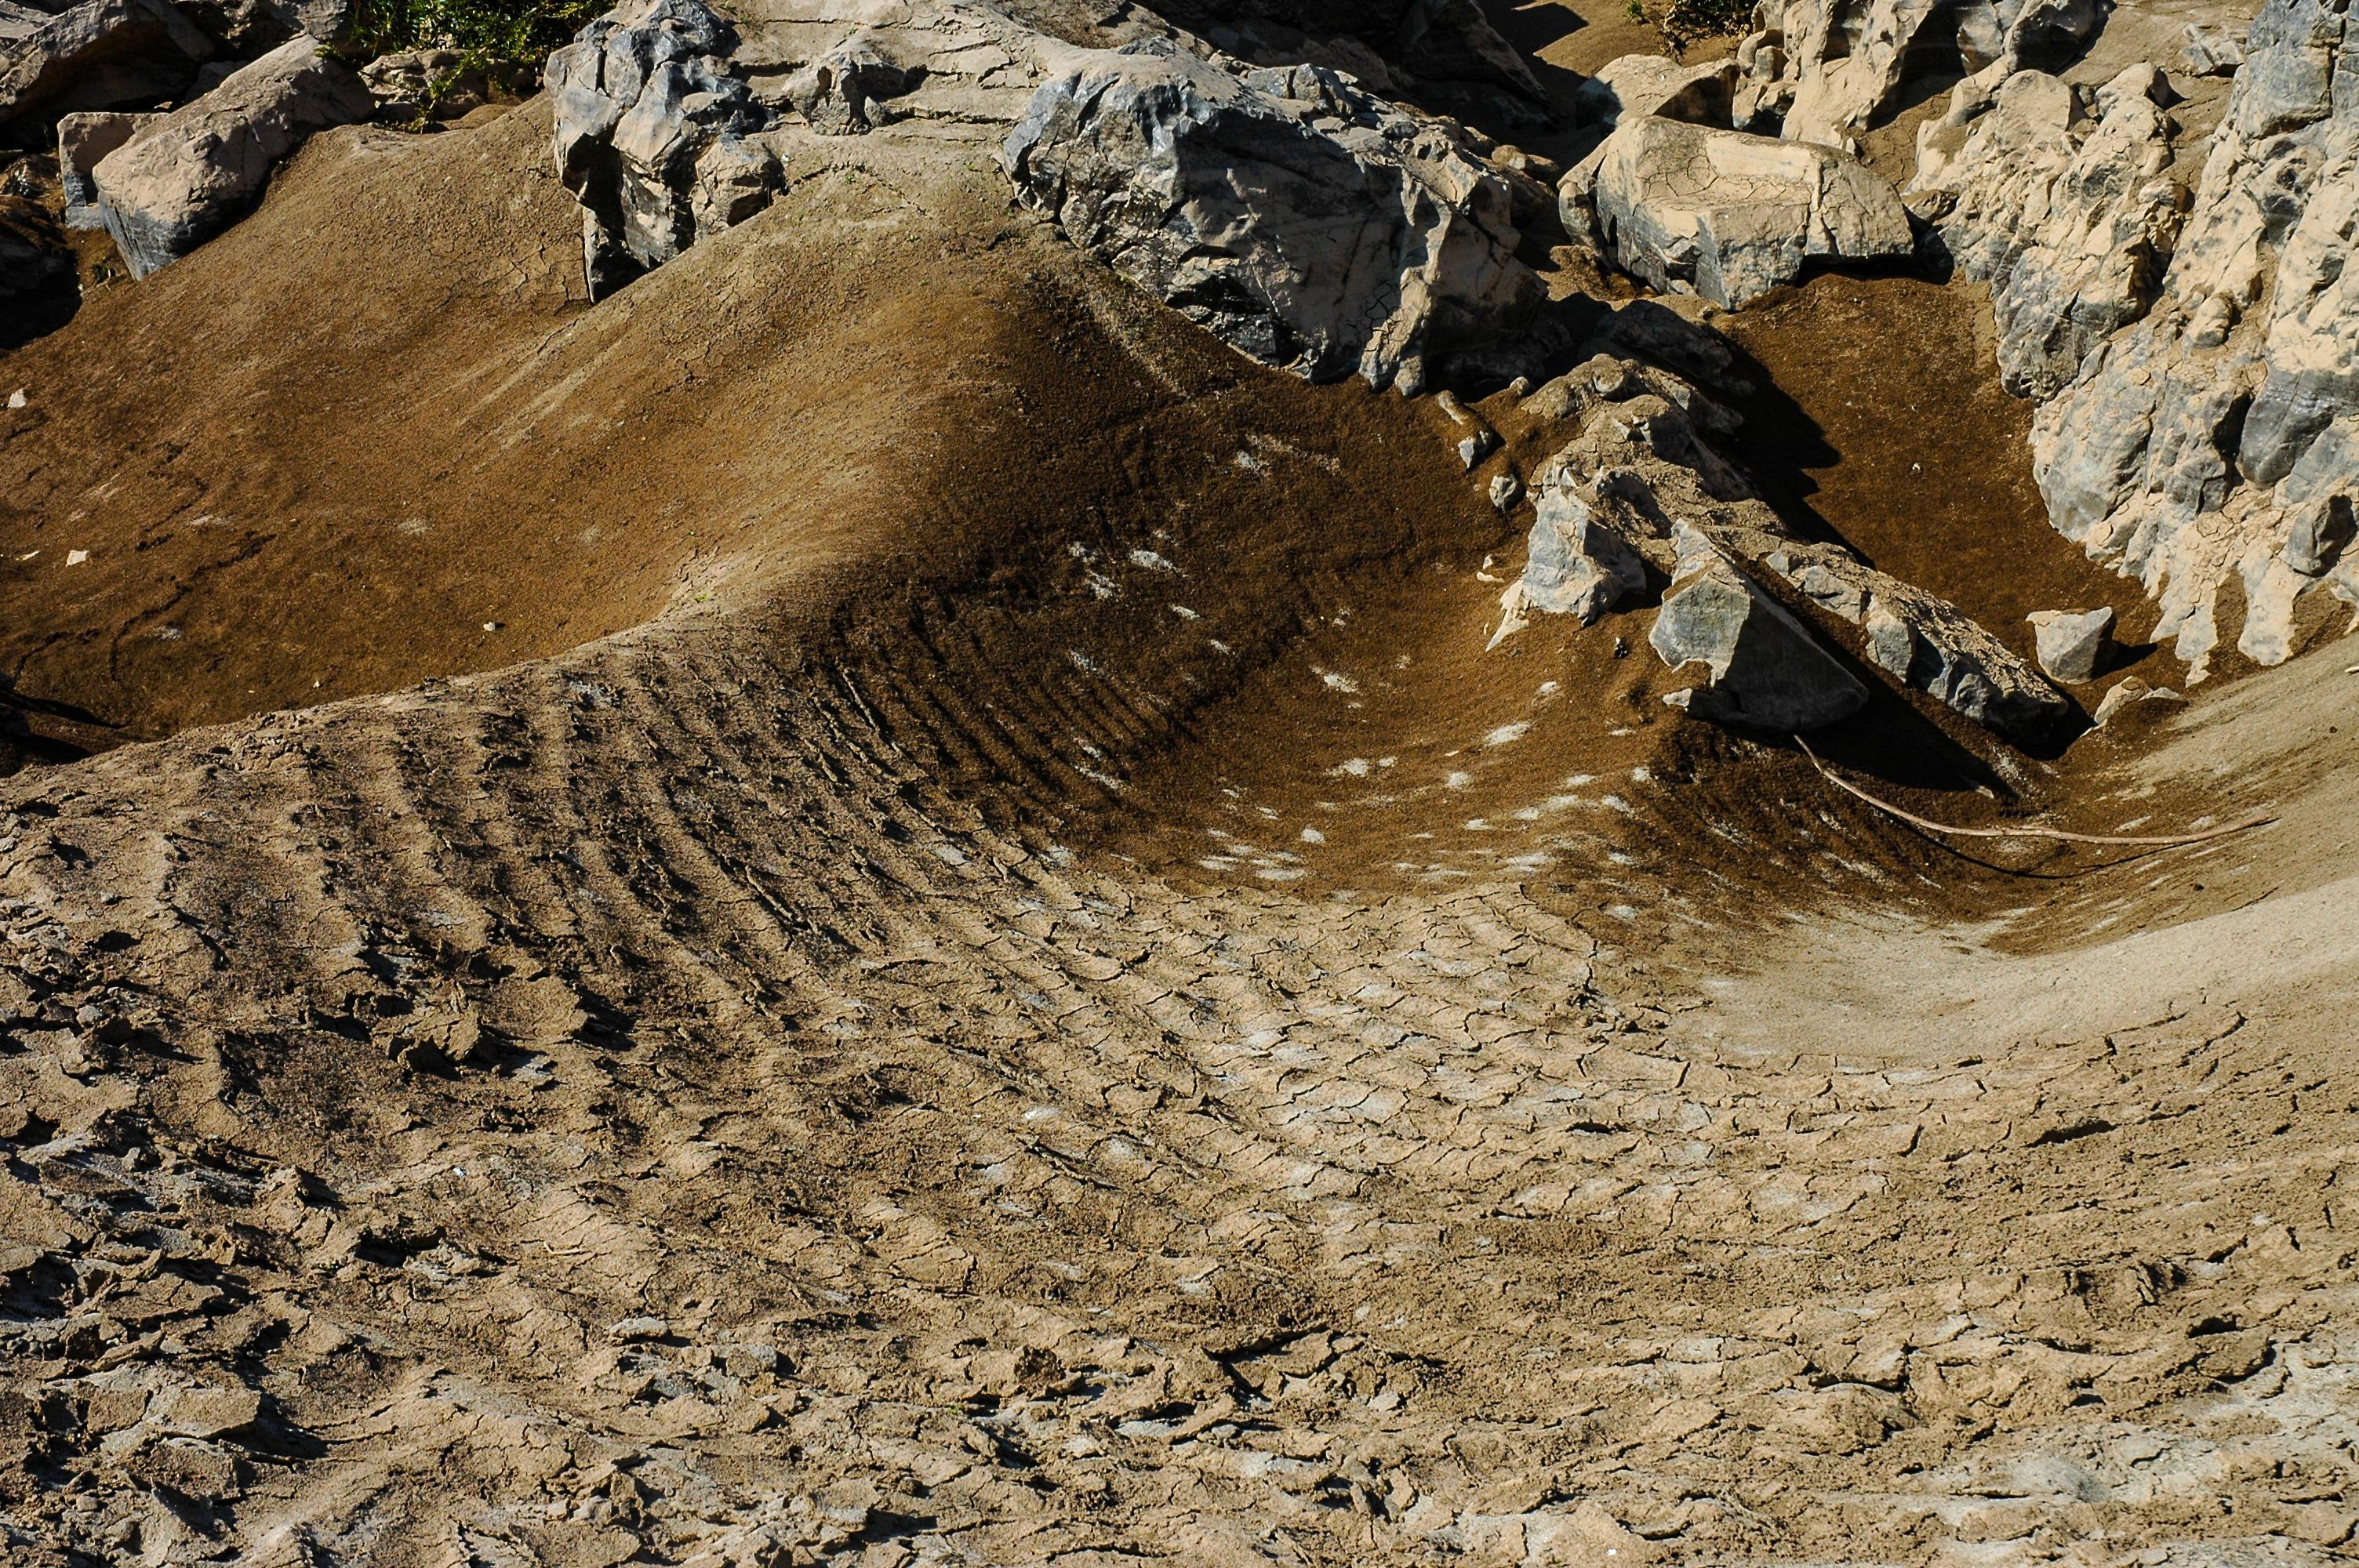 мечтала картинки глина песок камни мог еще